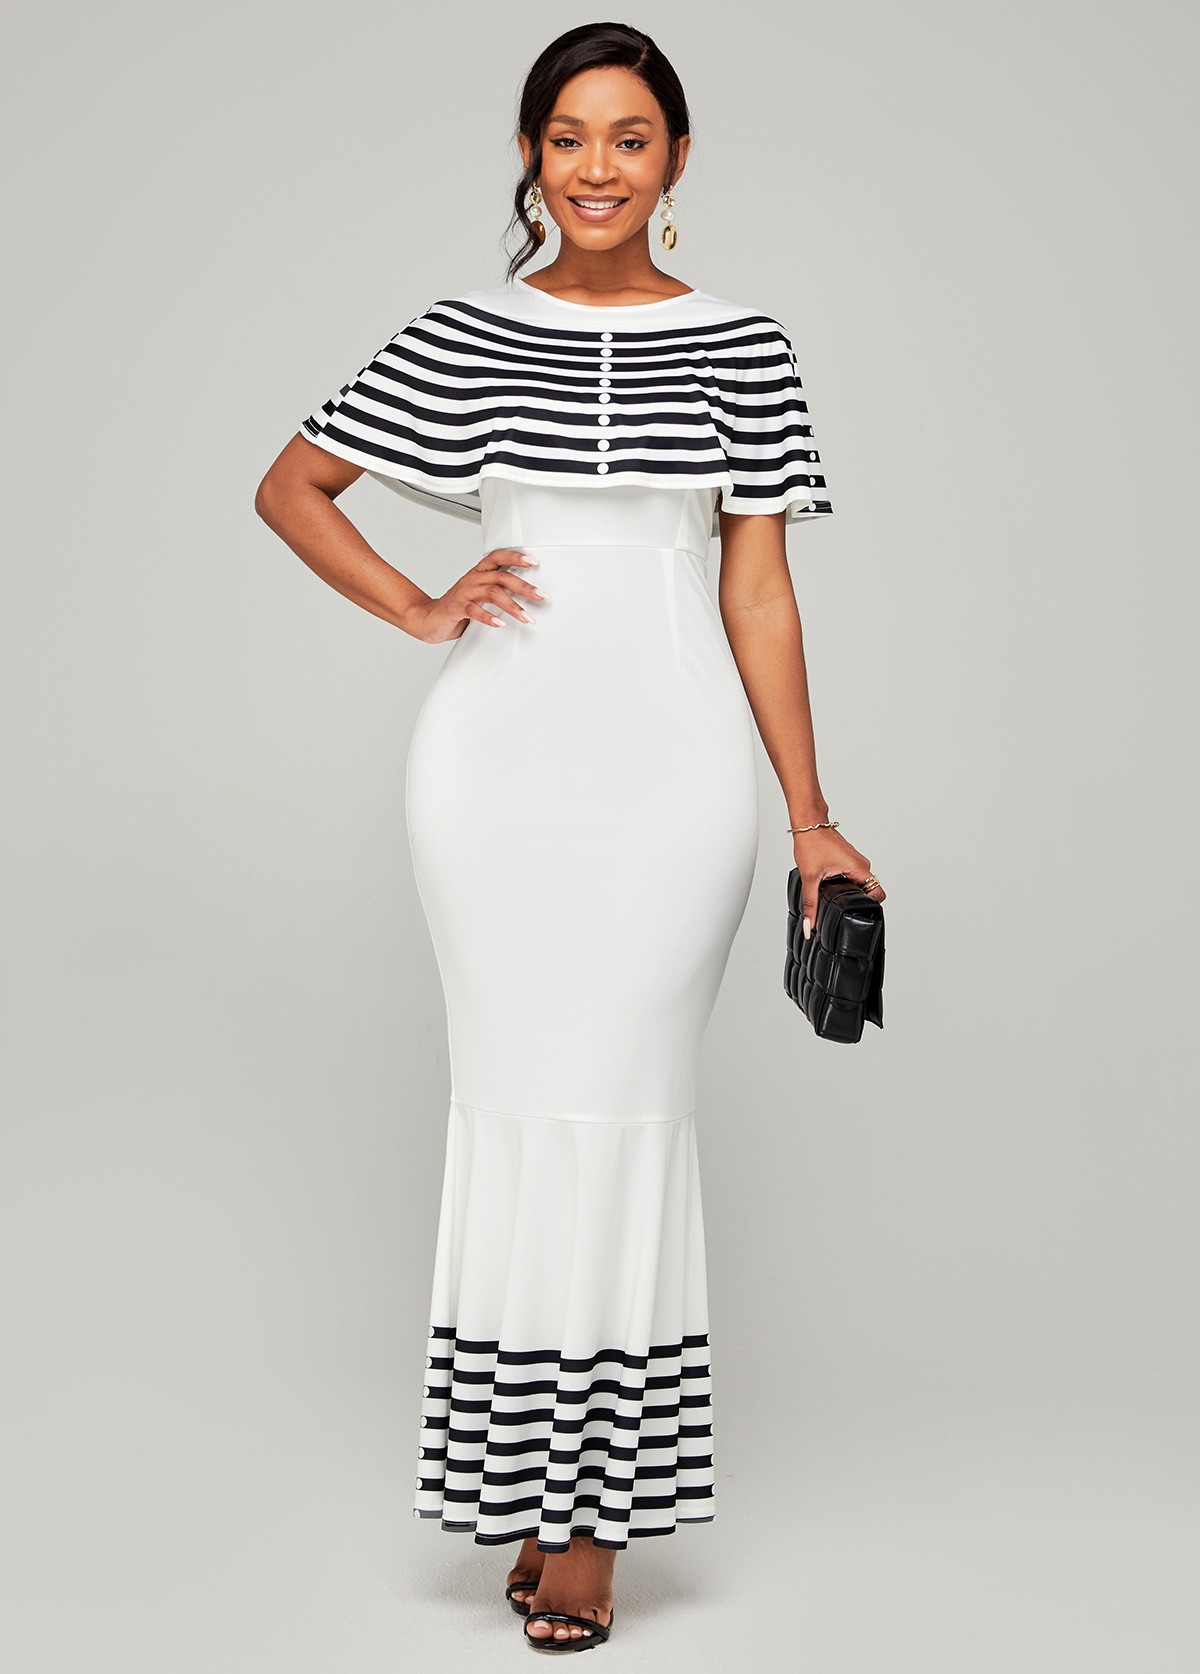 Cape Sleeve Striped Round Neck Mermaid Dress